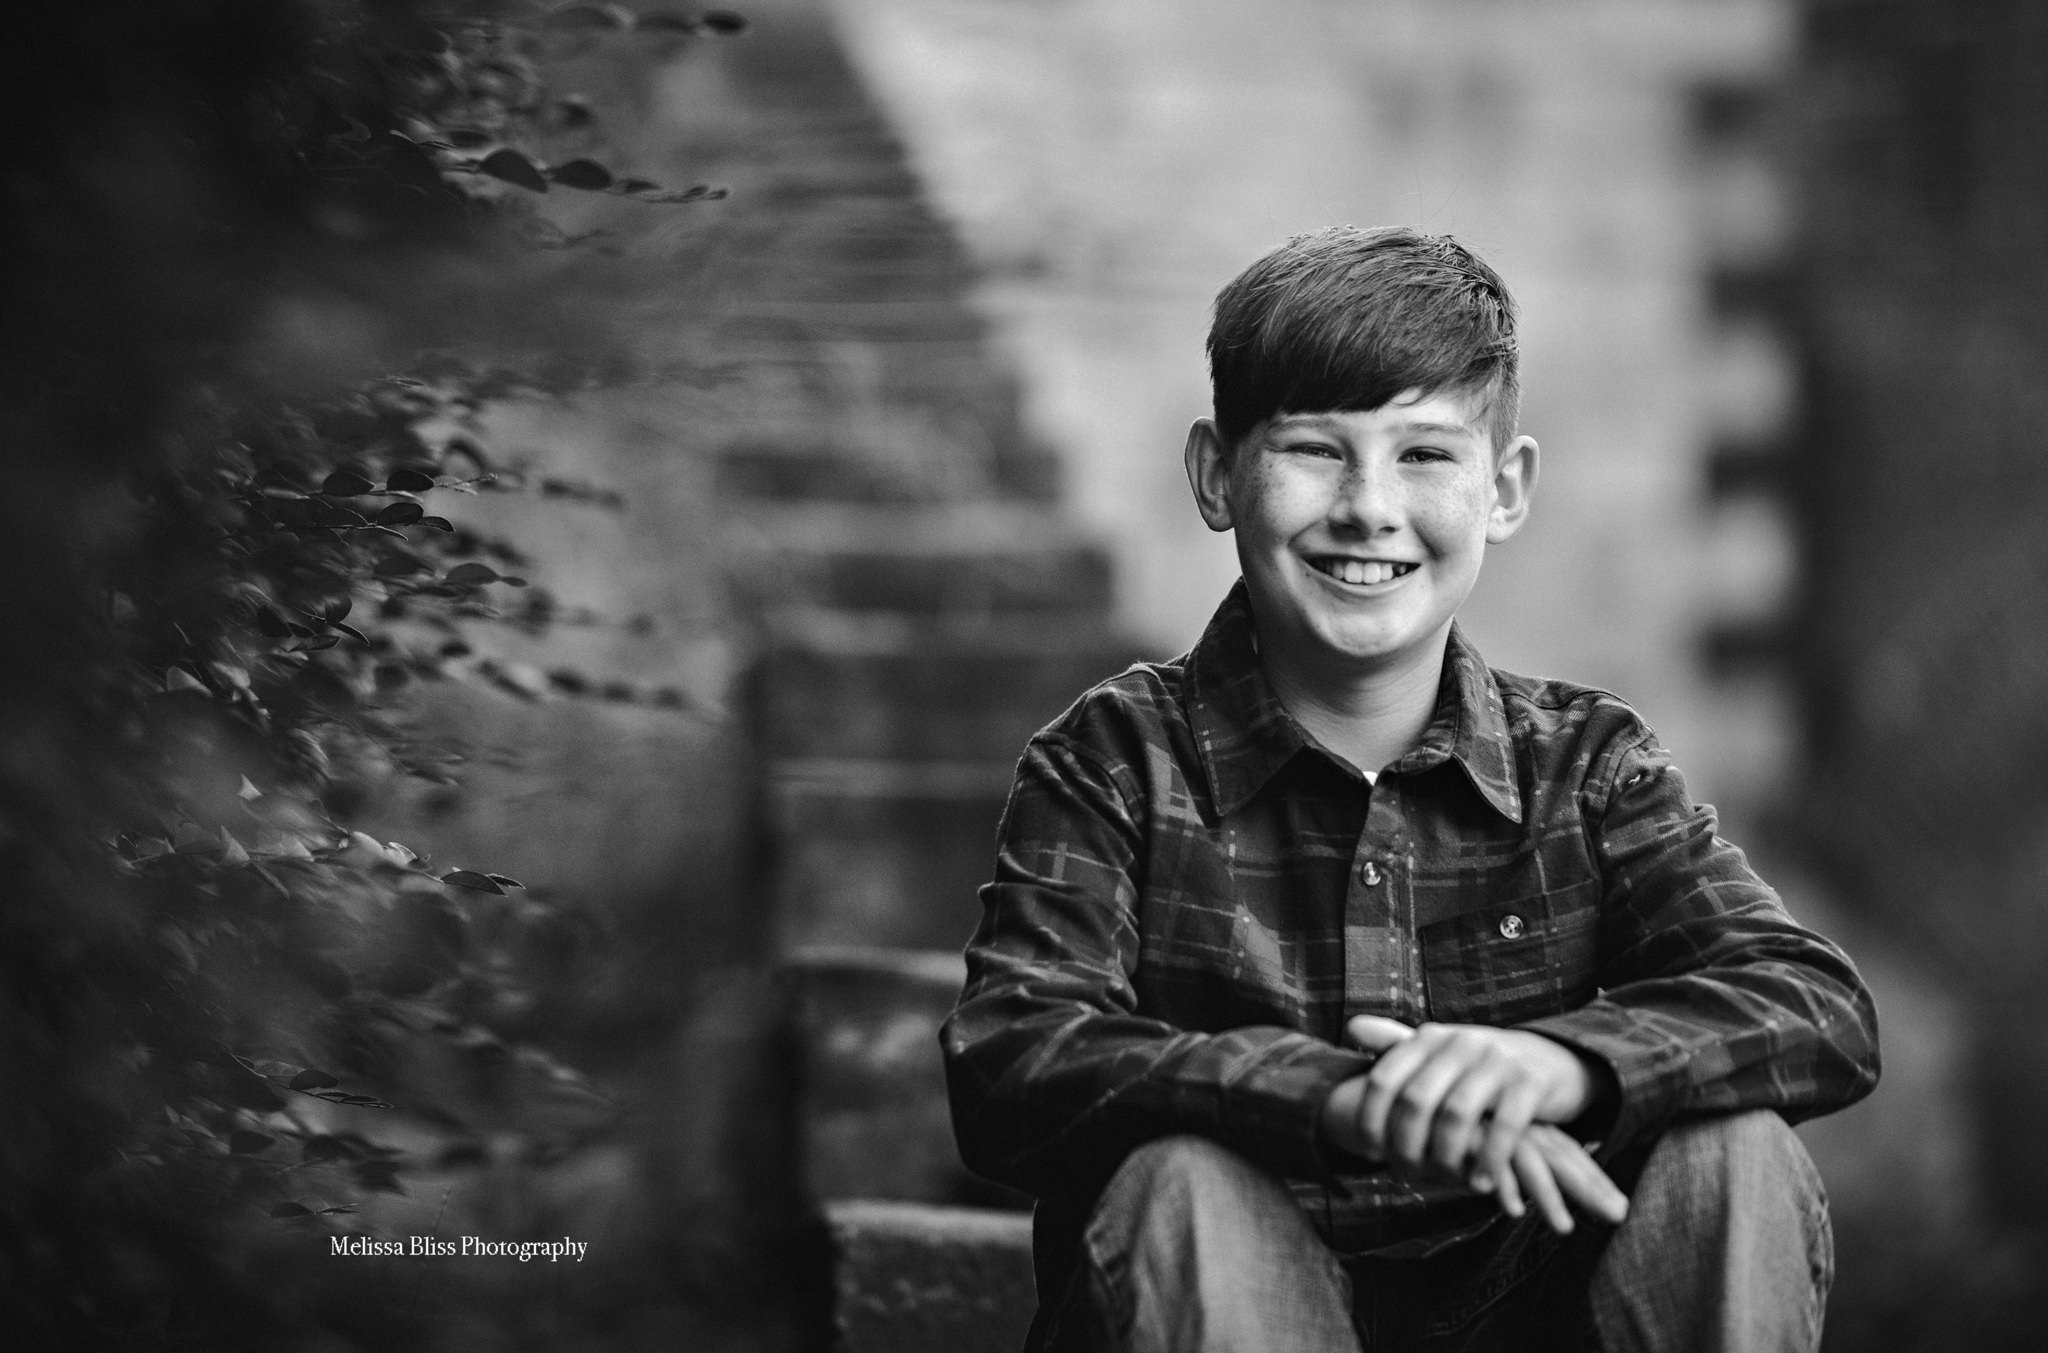 child-portrait-boy-at-fort-monroe-melissa-bliss-photography-norfolk-williamsburg-chesapeake-child-photographer.jpg